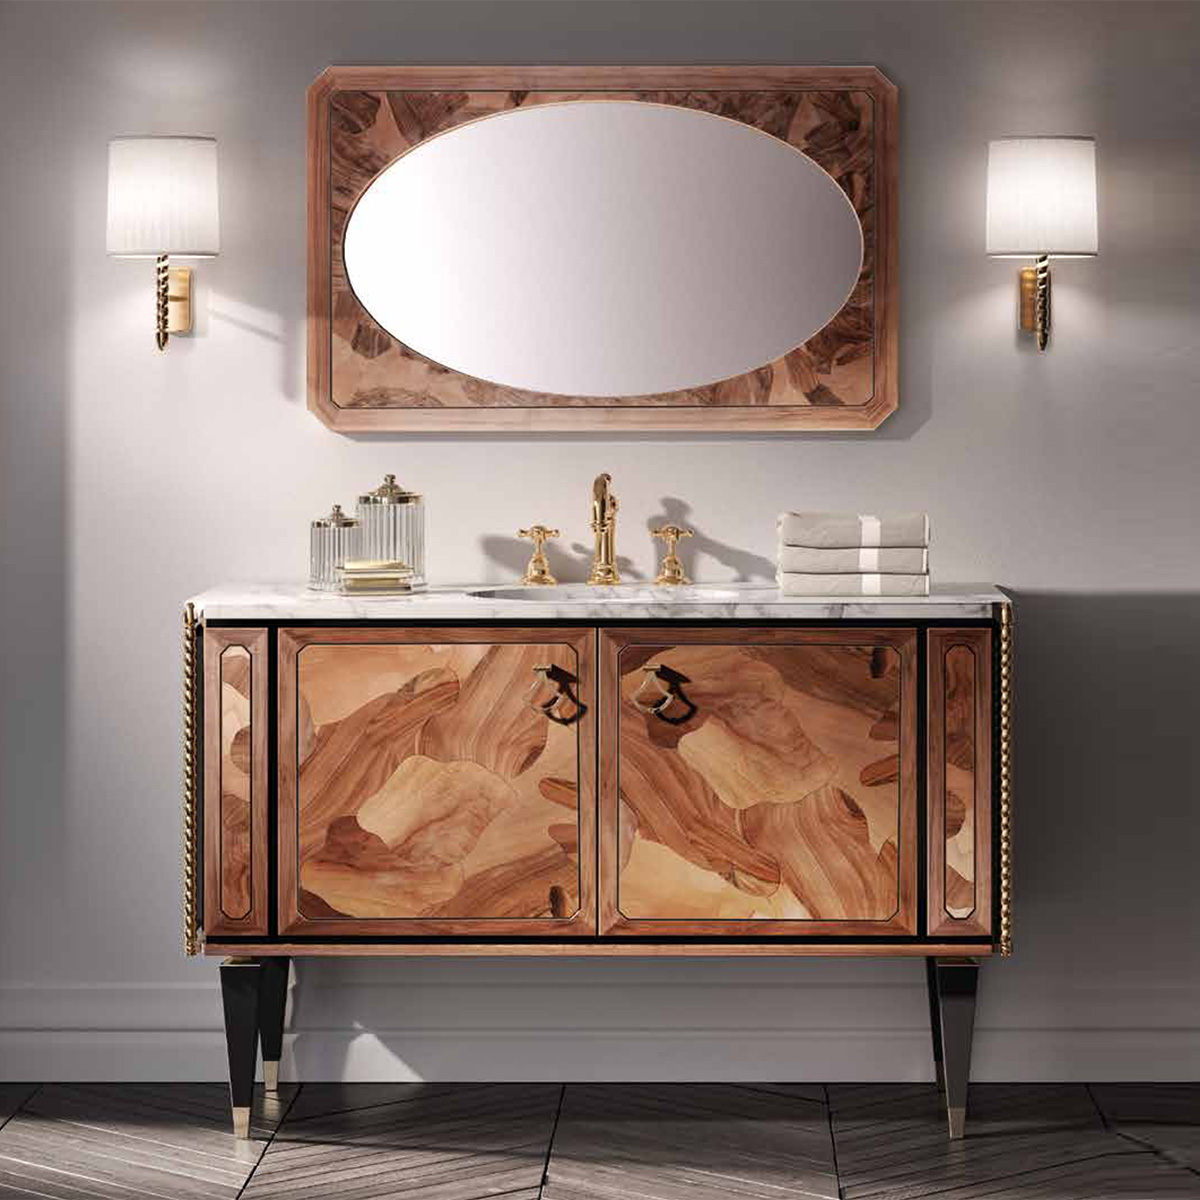 Mia Italia 48 Inch Petit 02 Finish Polish Wood Unique Bathroom Vanity